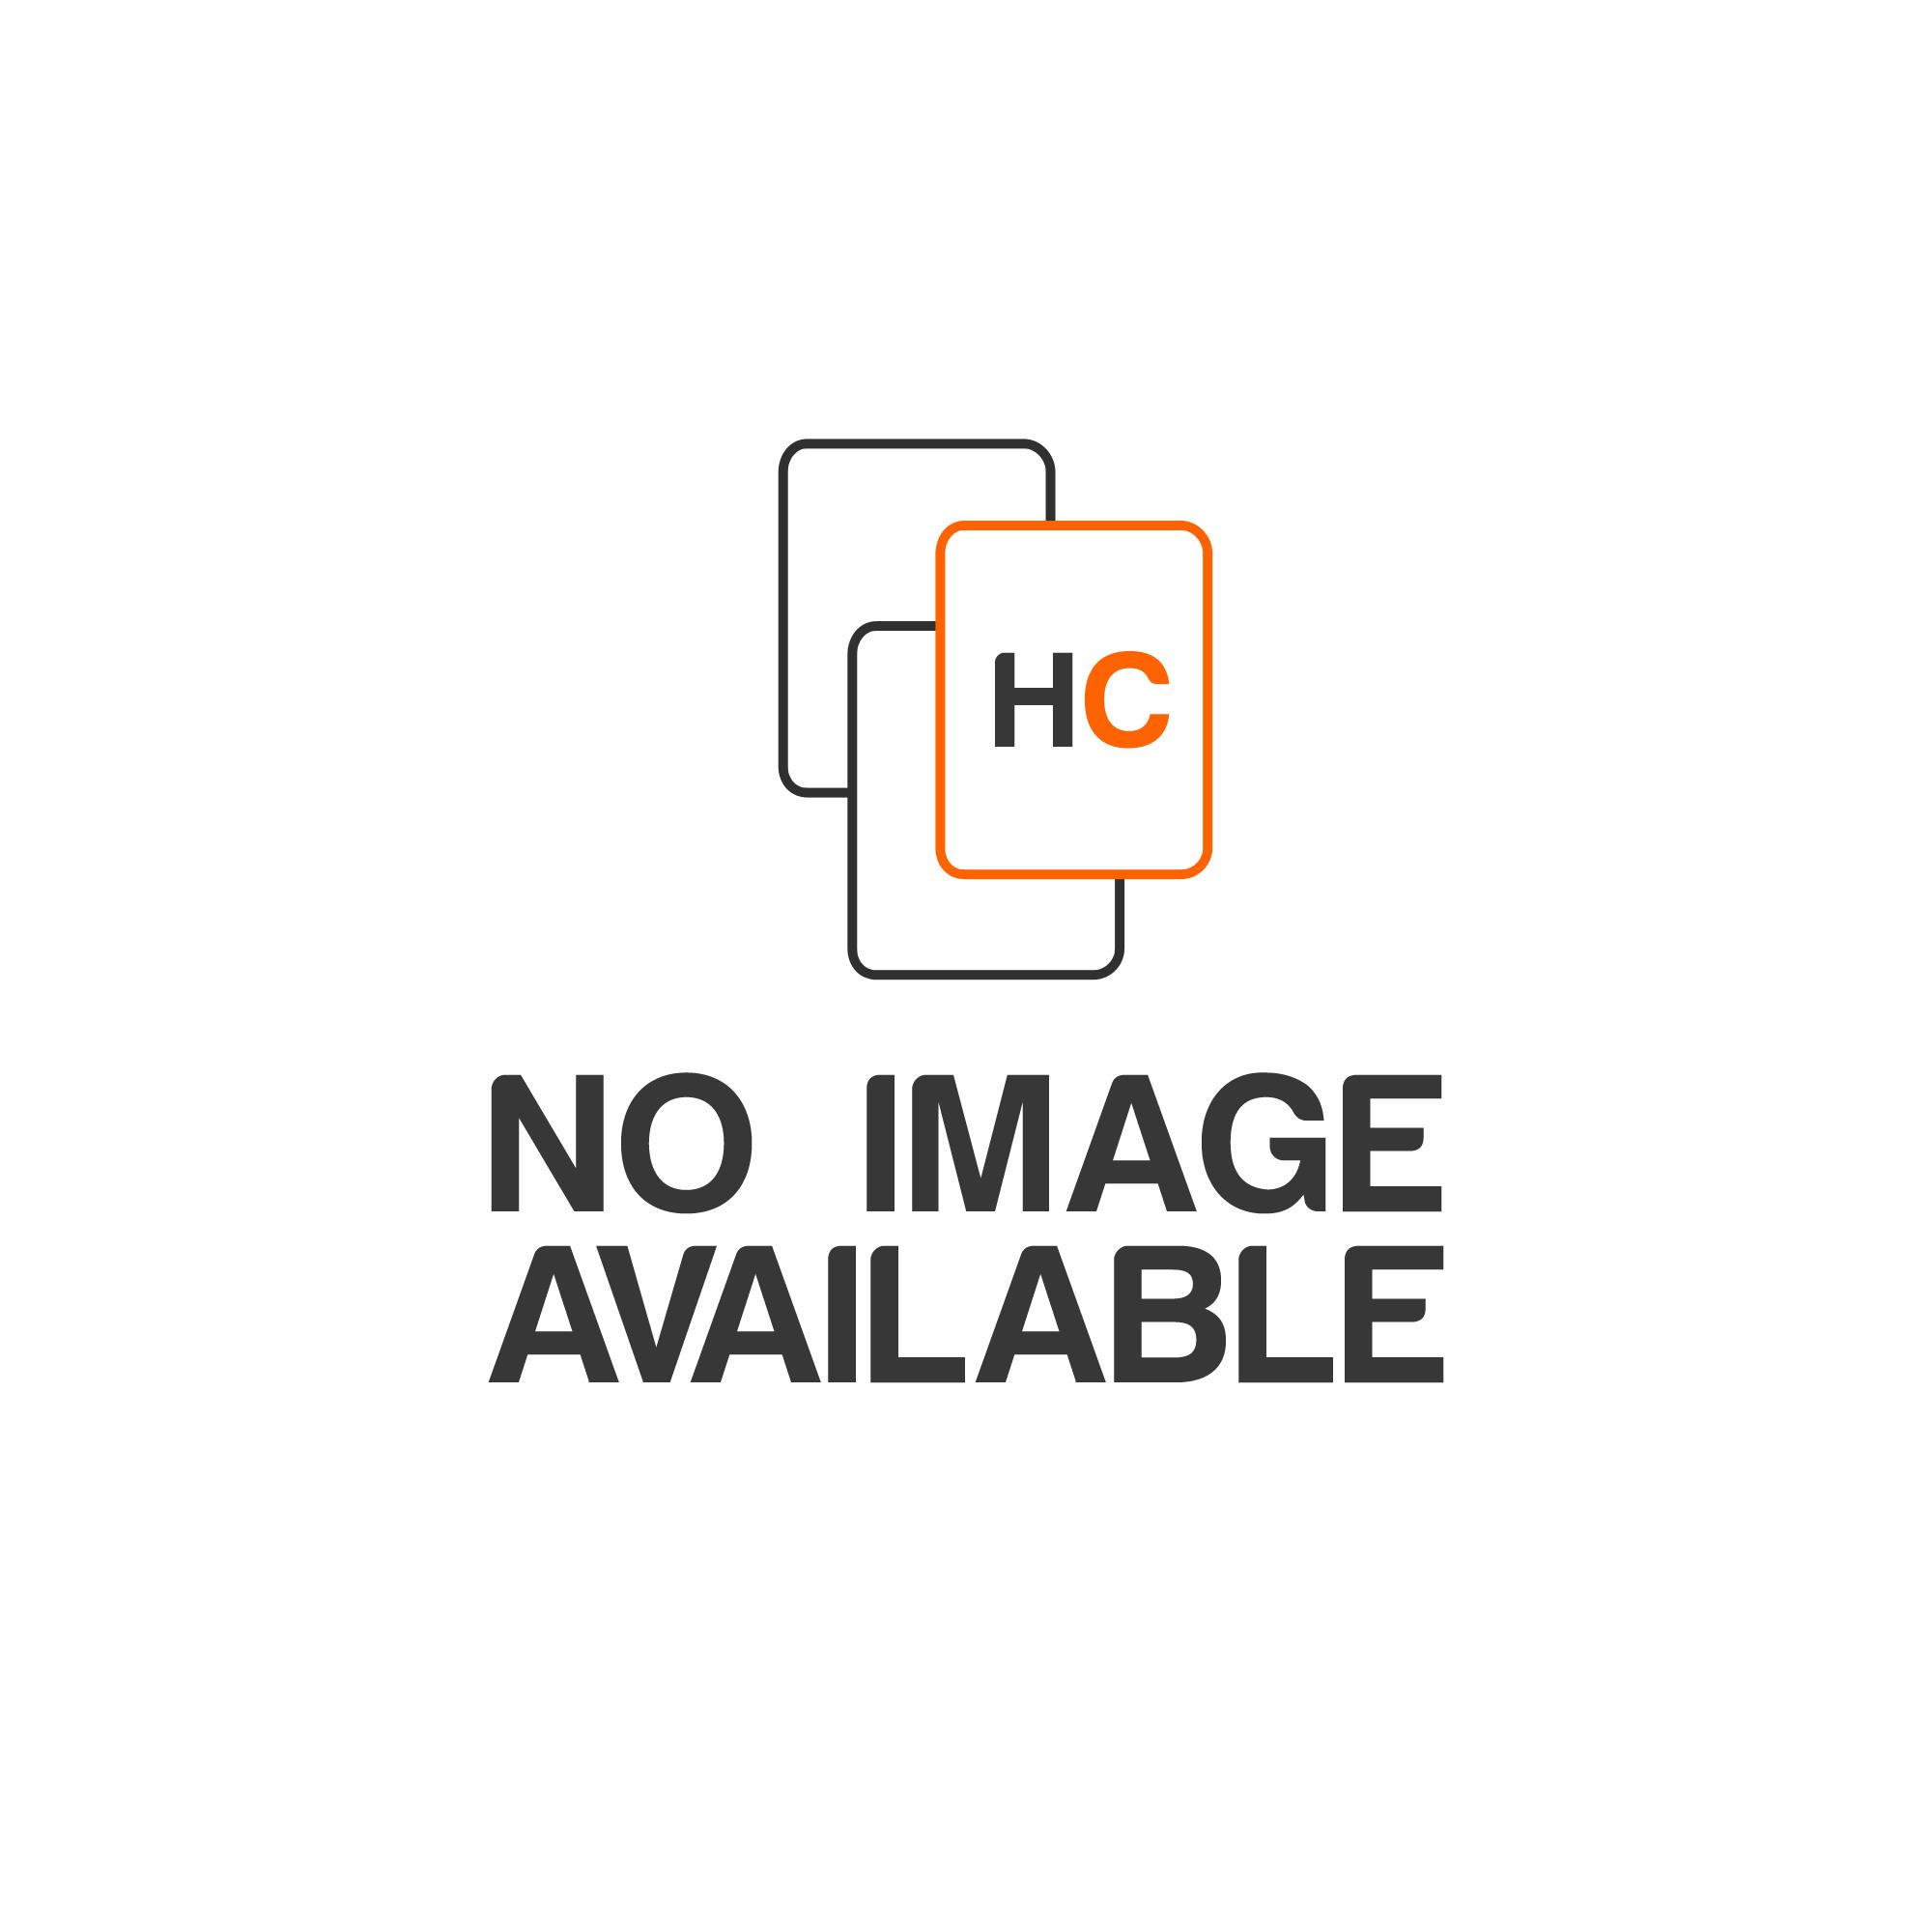 rini/_mc2 1 Pc Opal SunTop Surgical Steel Daith Helix Tragus Cartilage Barbell Stud Earring Pink